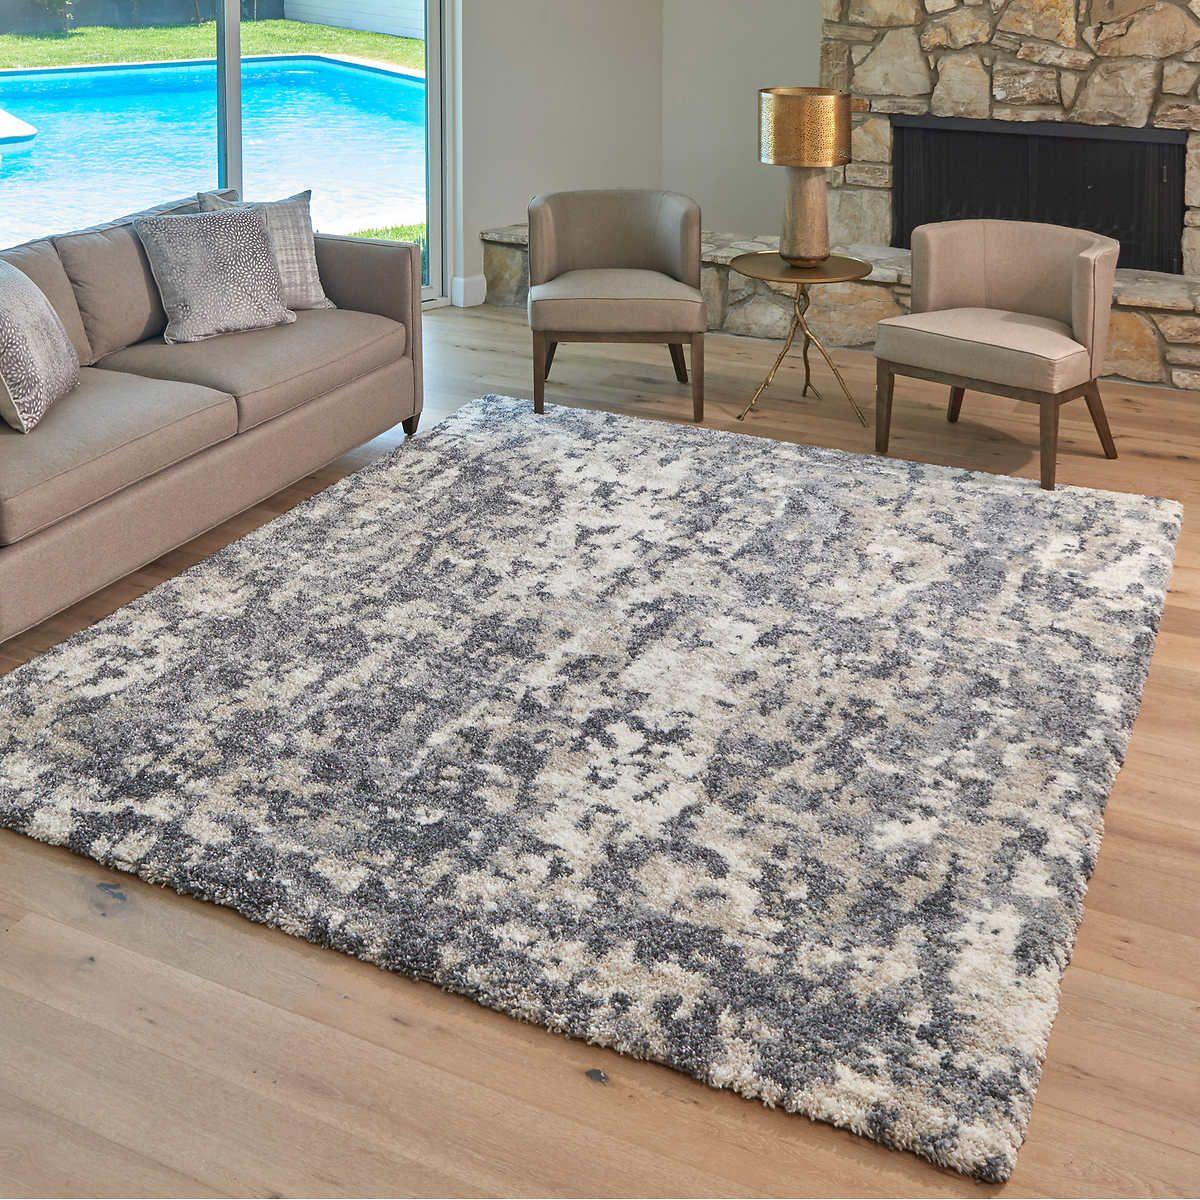 Lenox Super Lush Shag Area Rug Bryce Gray In 2020 Shag Area Rug Rugs In Living Room Area Rugs